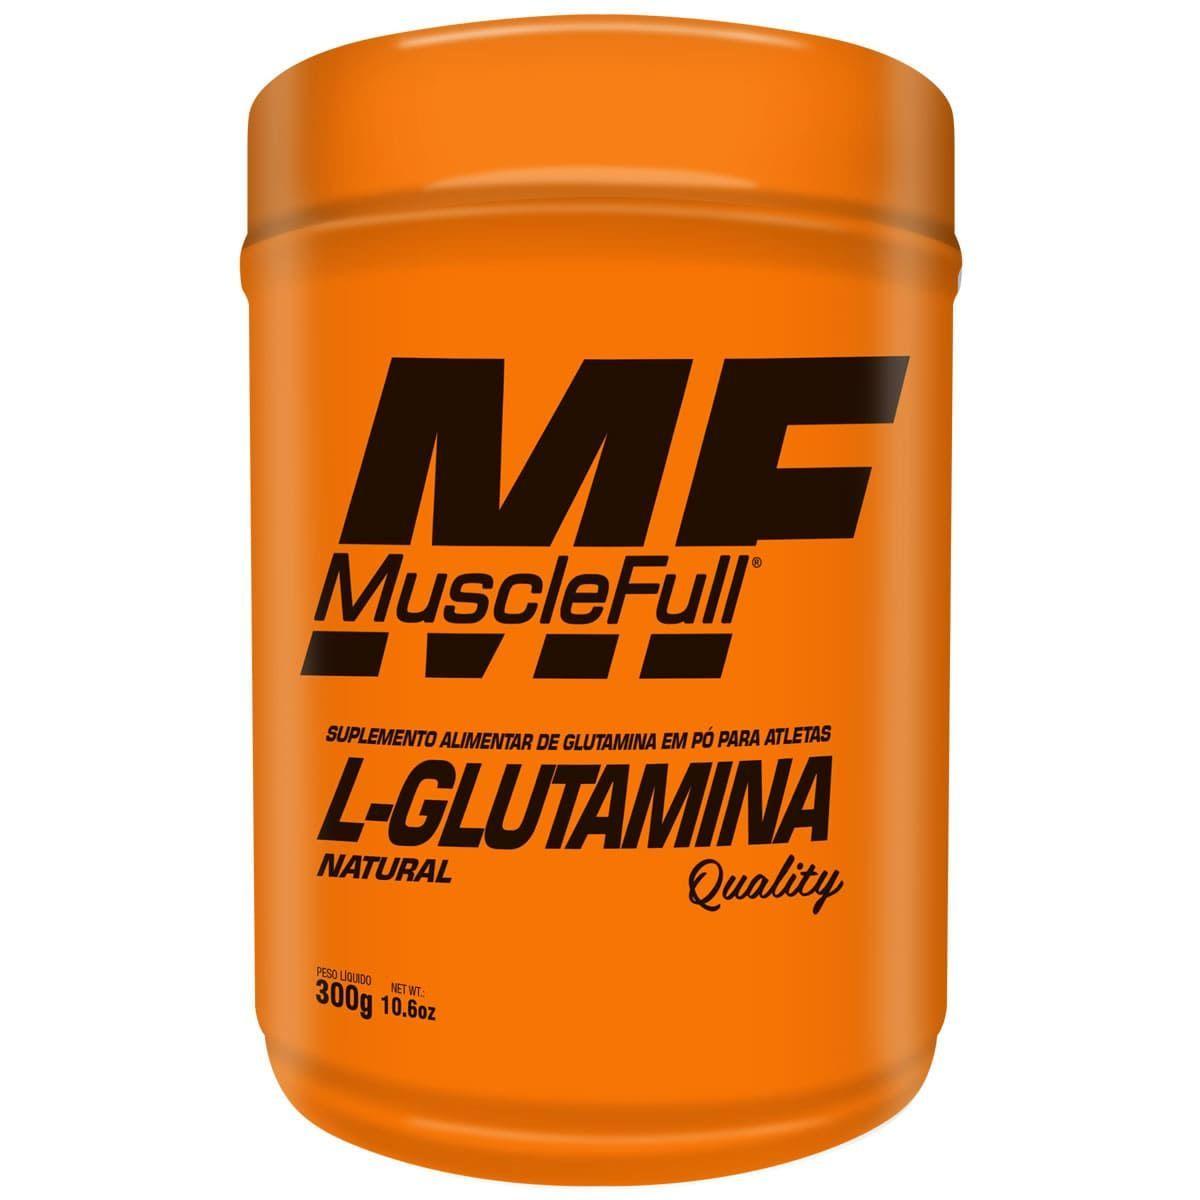 L-Glutamina Quality - MuscleFull - 300g